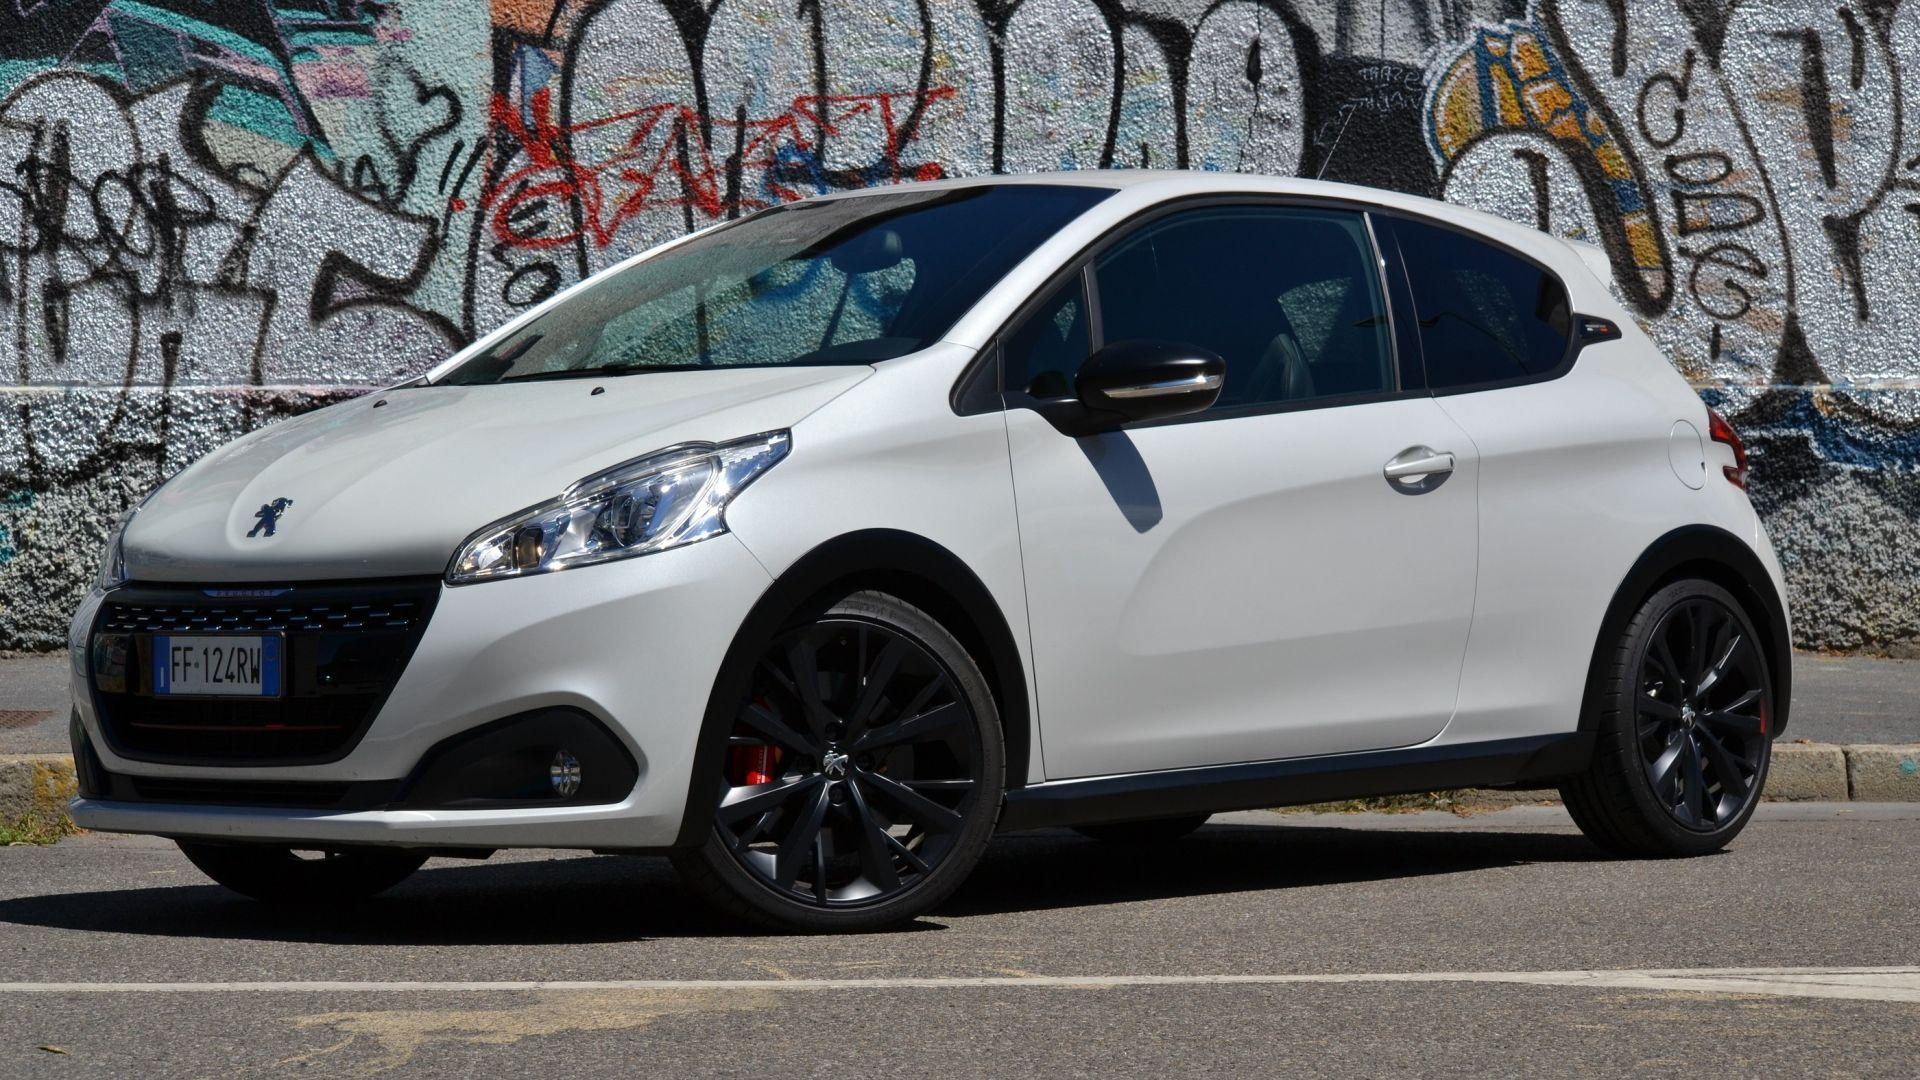 Top Line Auto >> Peugeot 208 diesel, benzina, gpl o GTi: quale fa per me ...